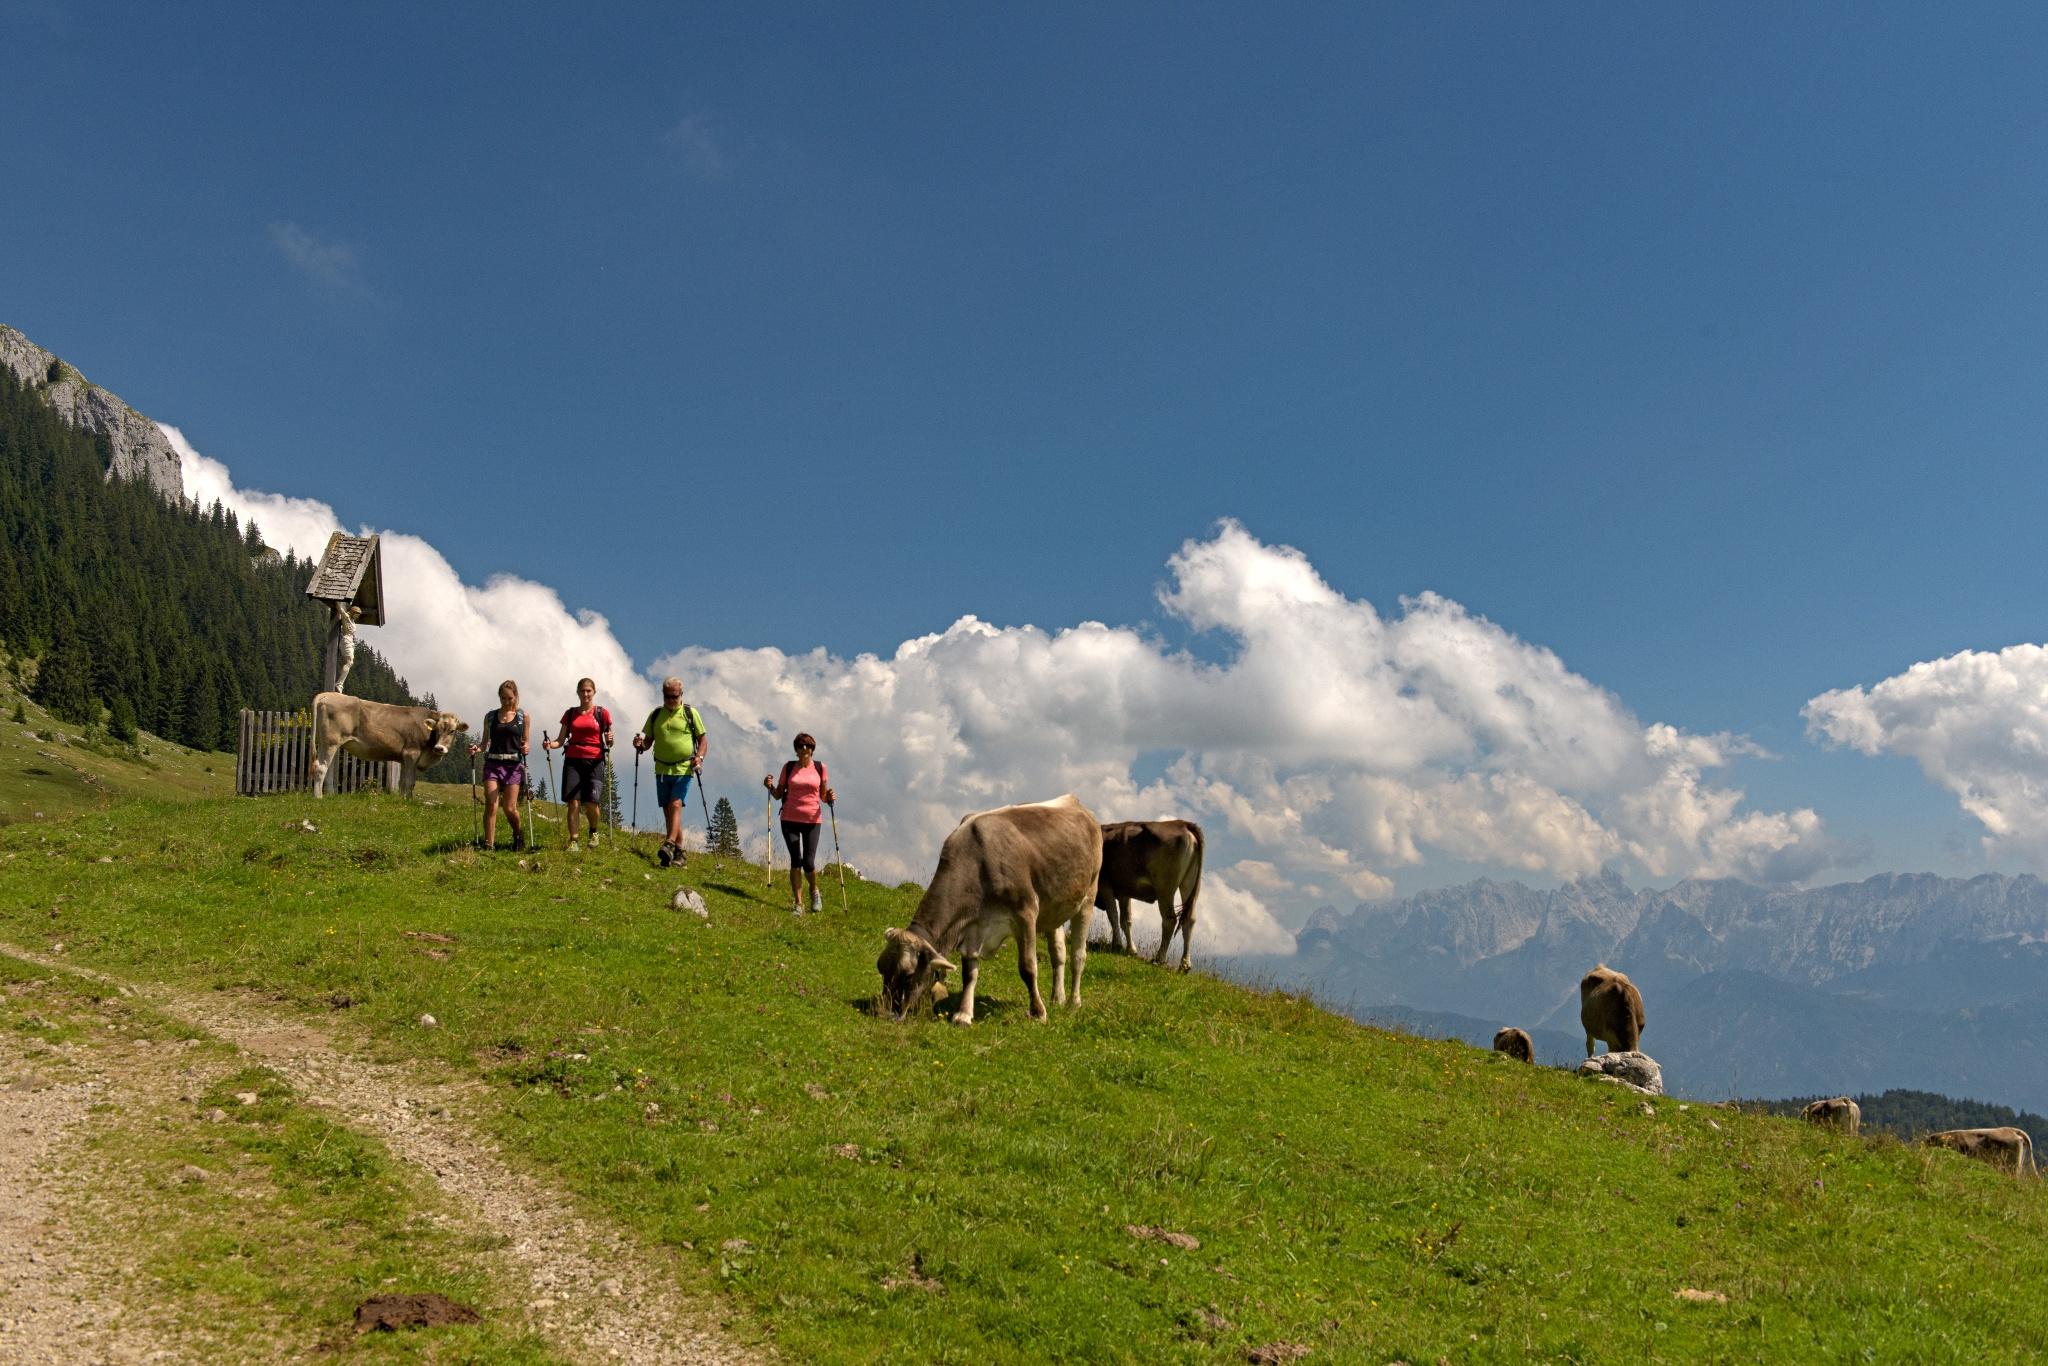 Wandern im Brünnsteingebiet/Himmelmoos Almen